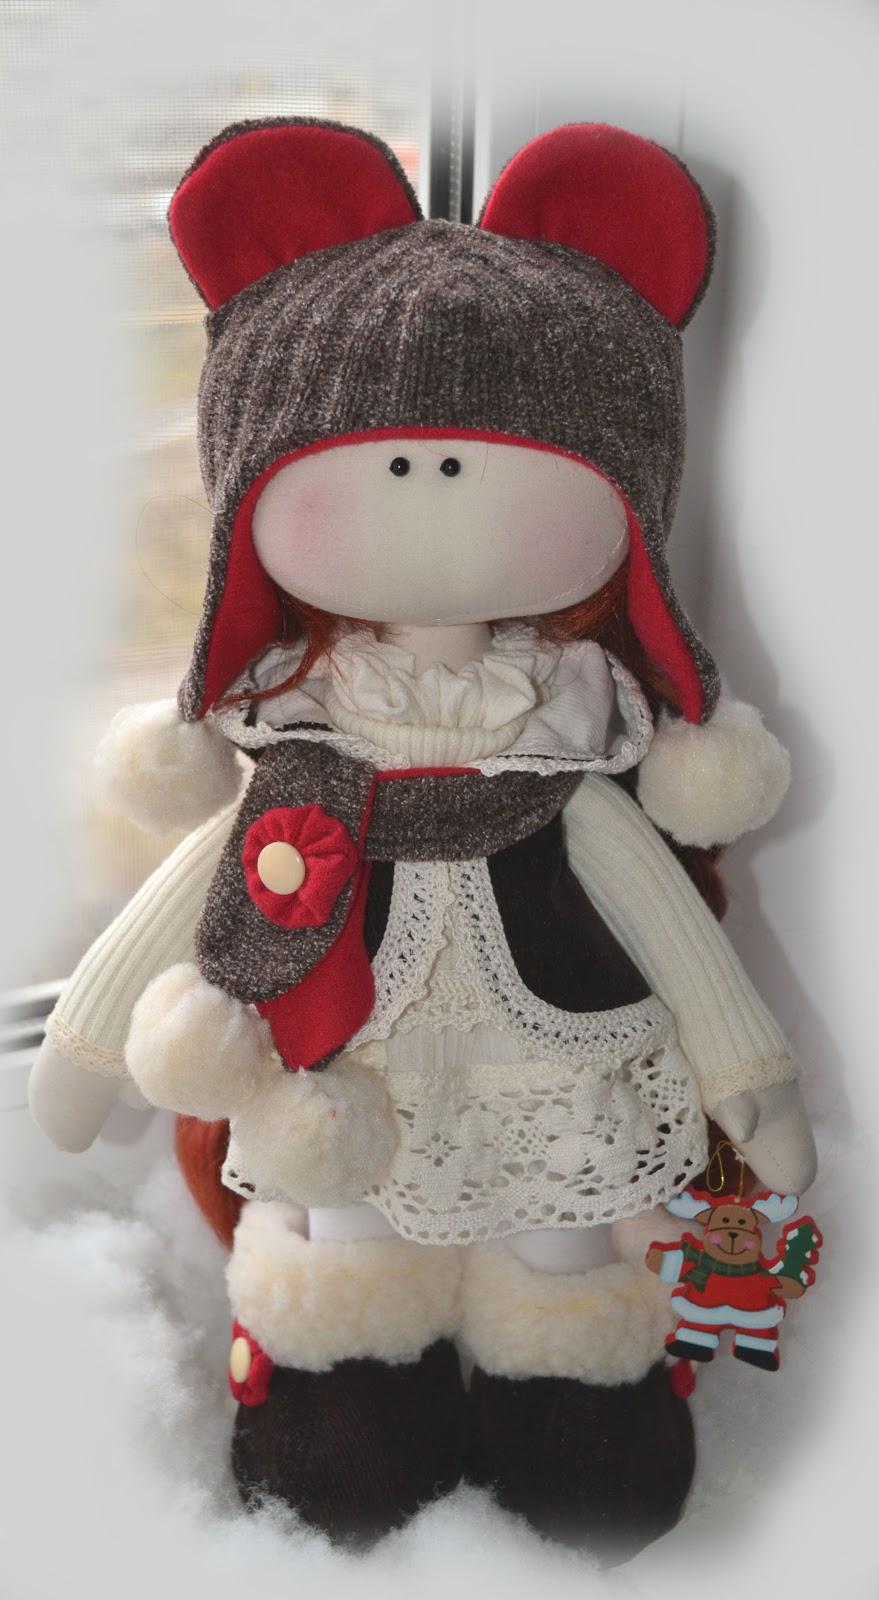 Подборка картинок Кукол тильда 44